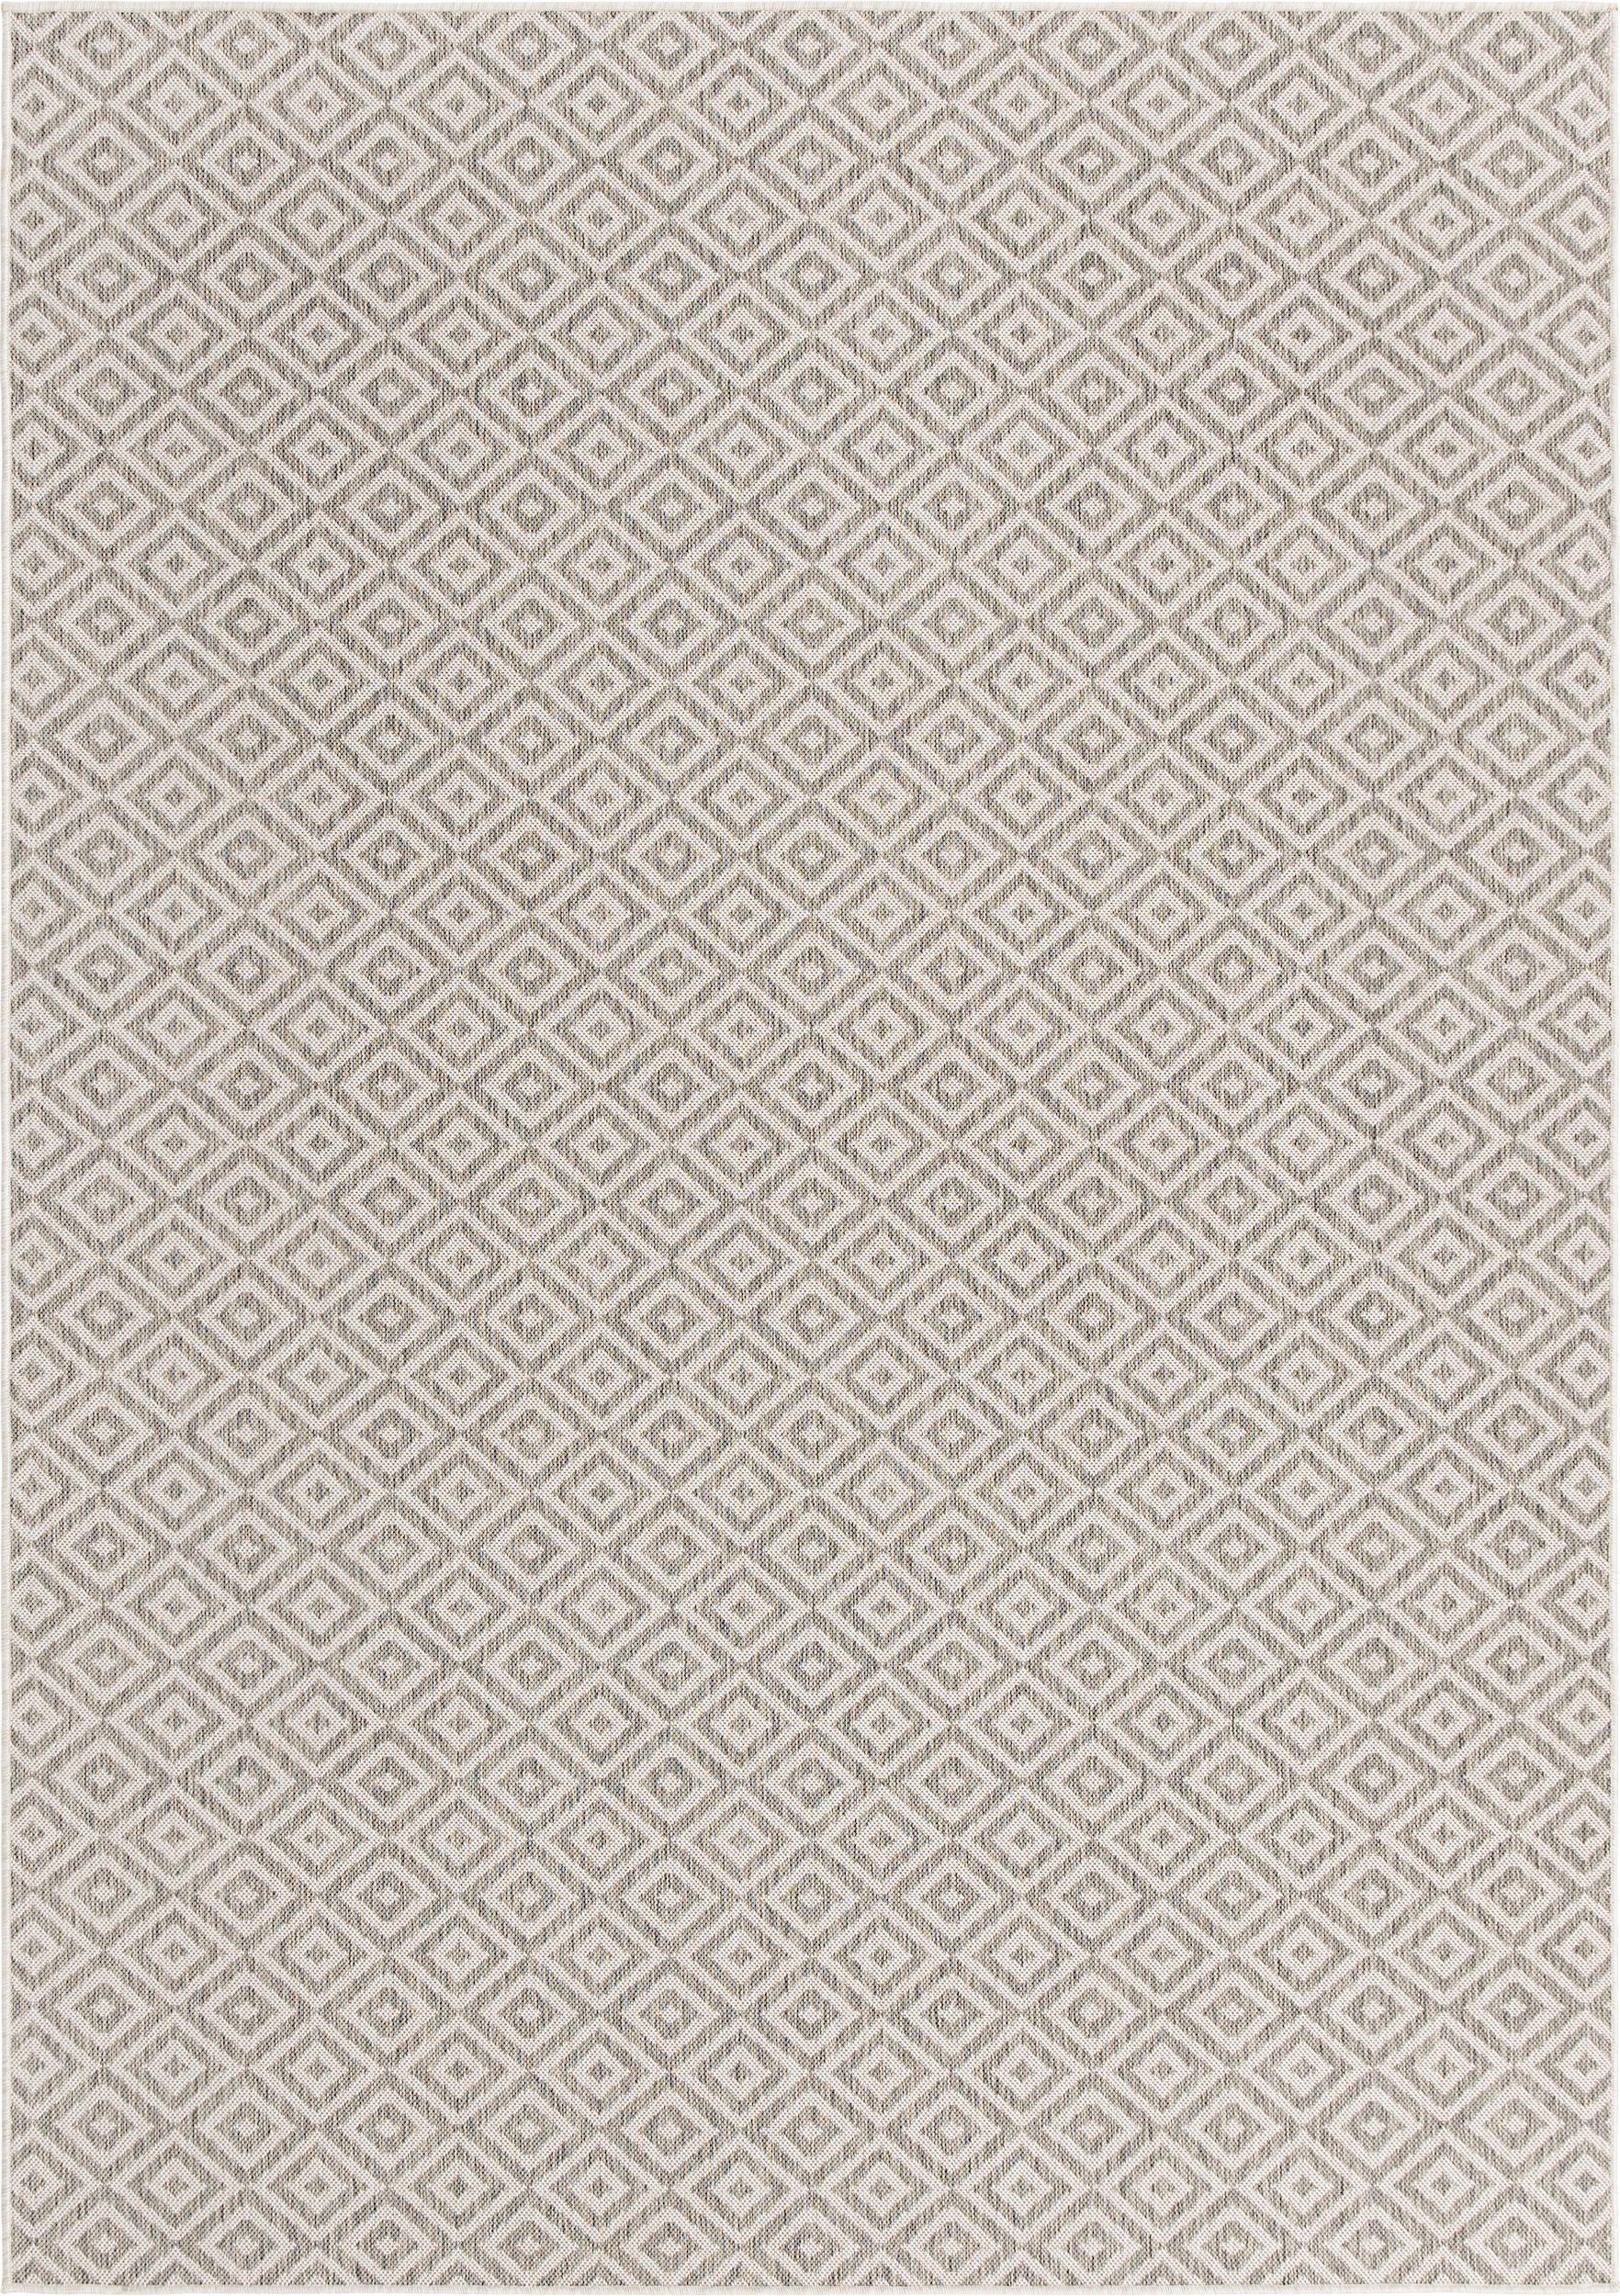 rugpal destiny indoor/outdoor area rug collection